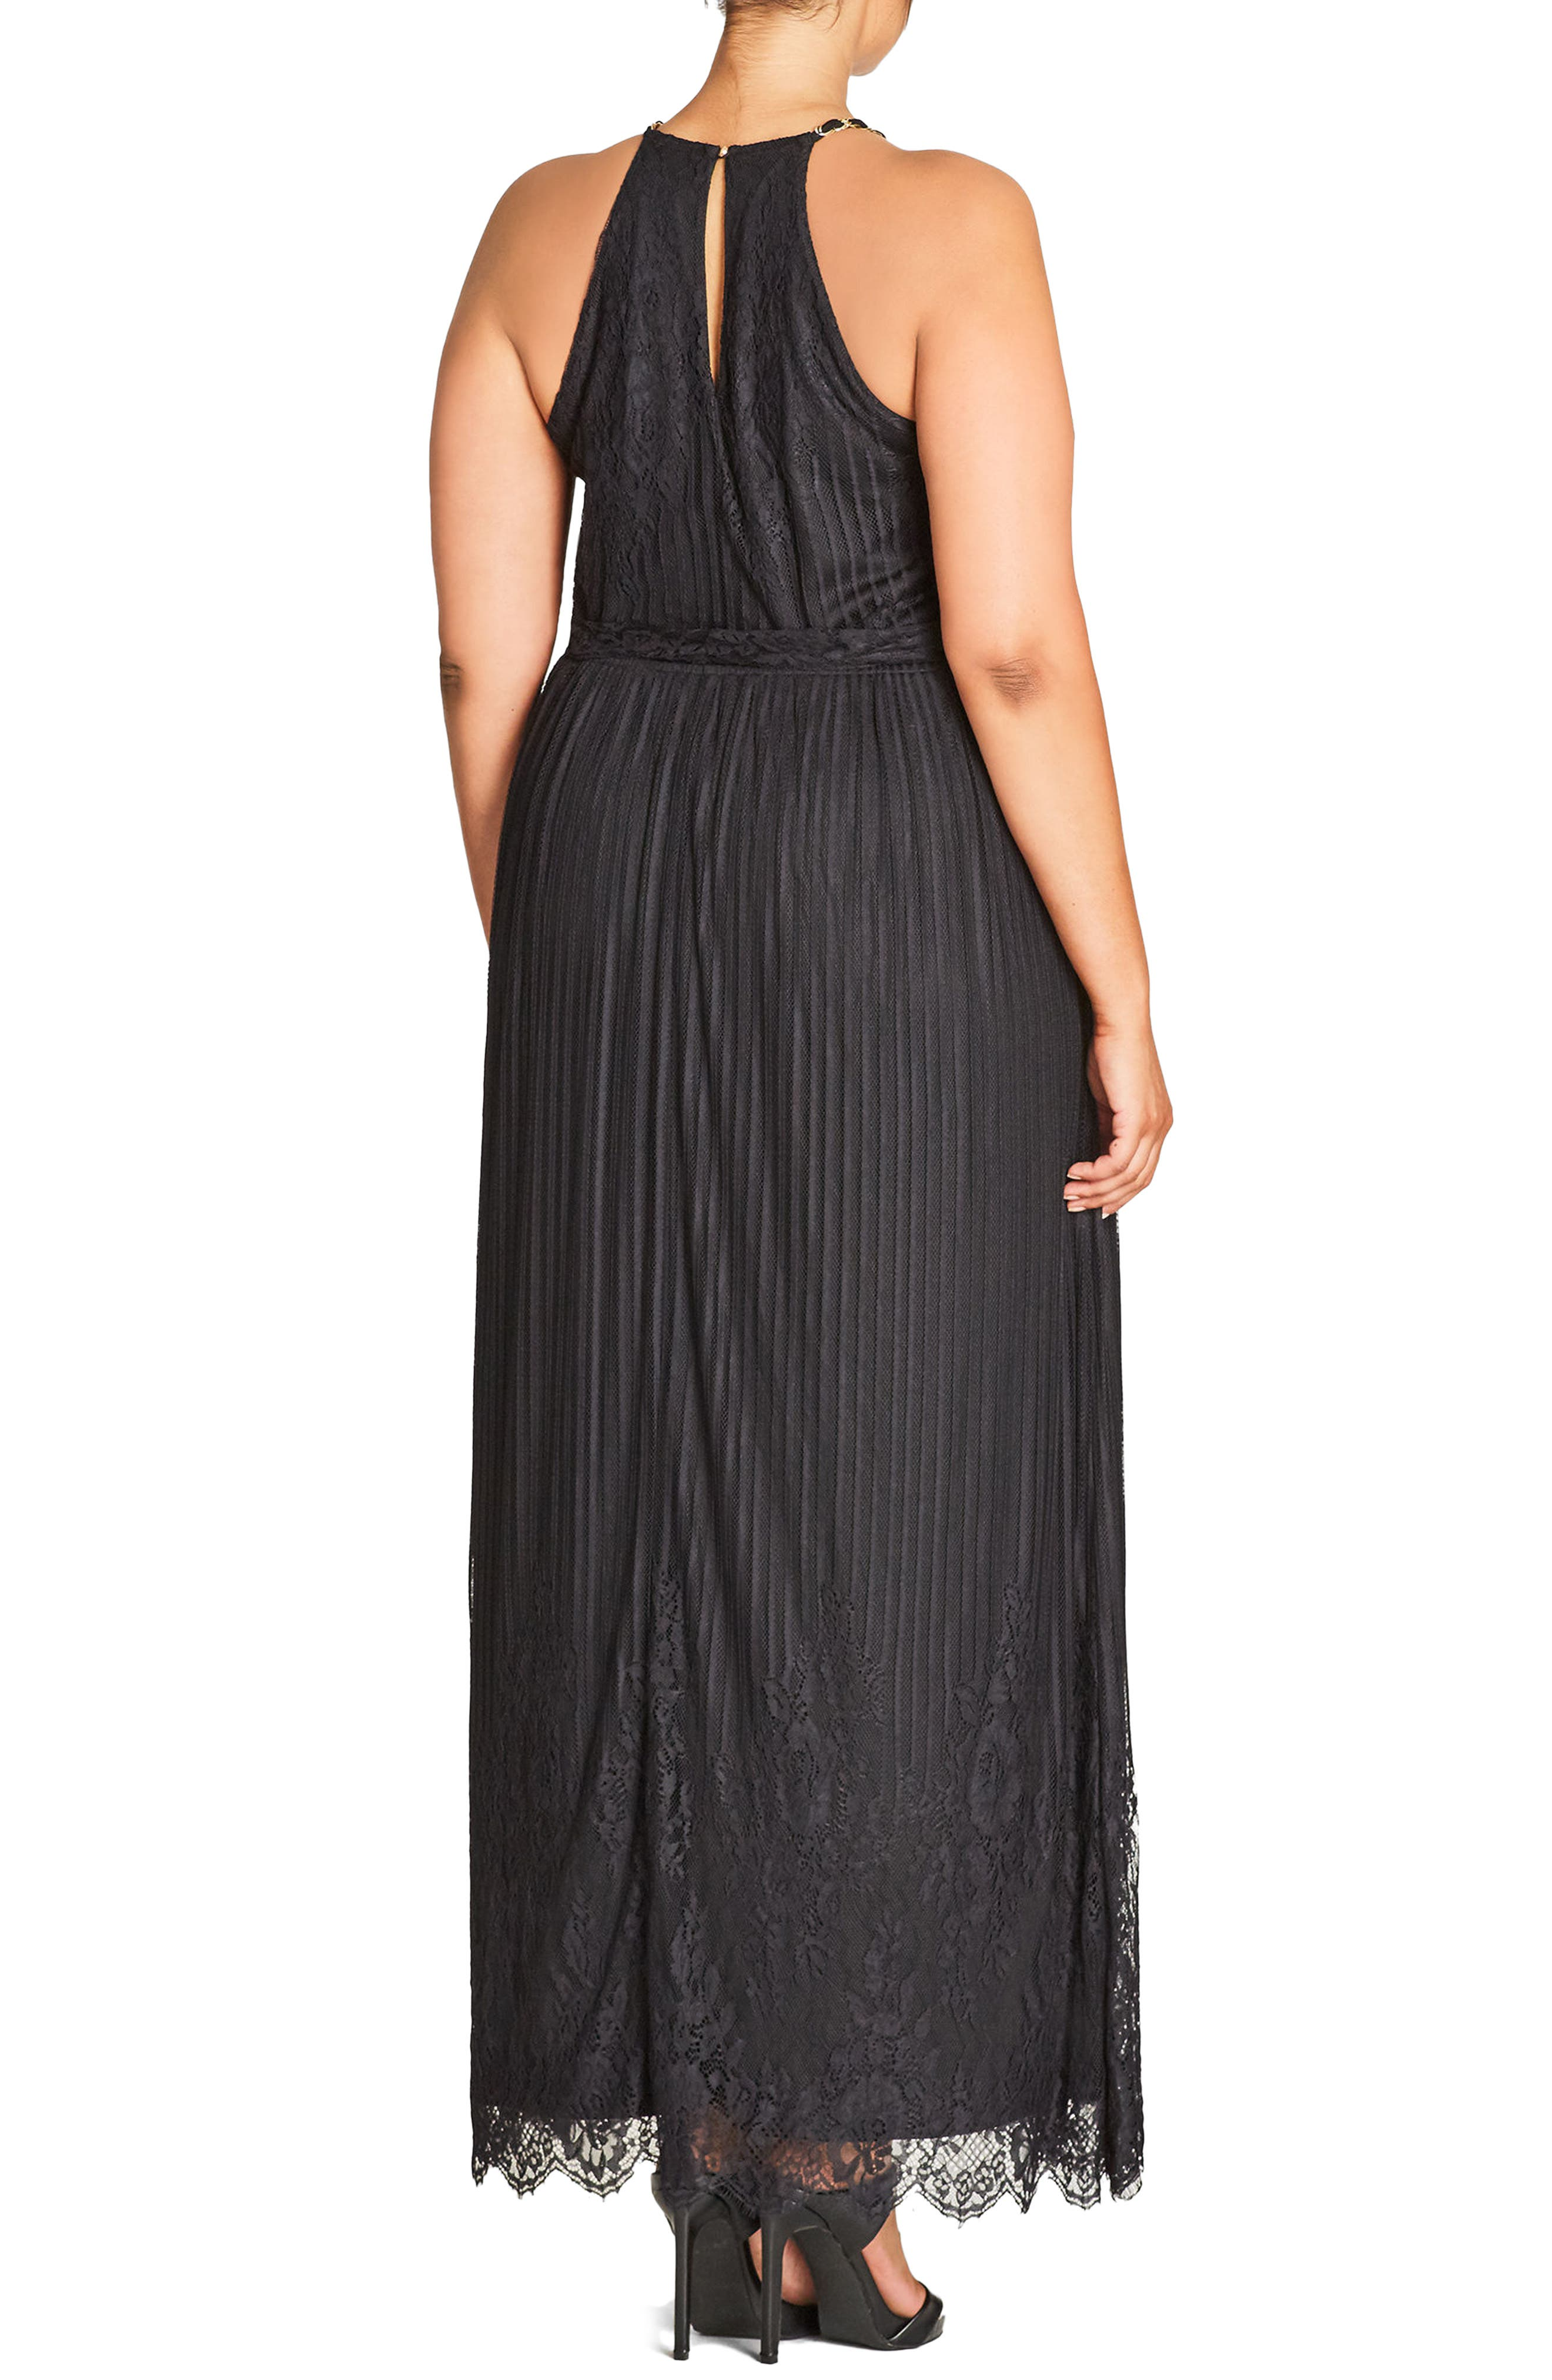 Studio 54 Stripe Lace Maxi Dress,                             Alternate thumbnail 2, color,                             001